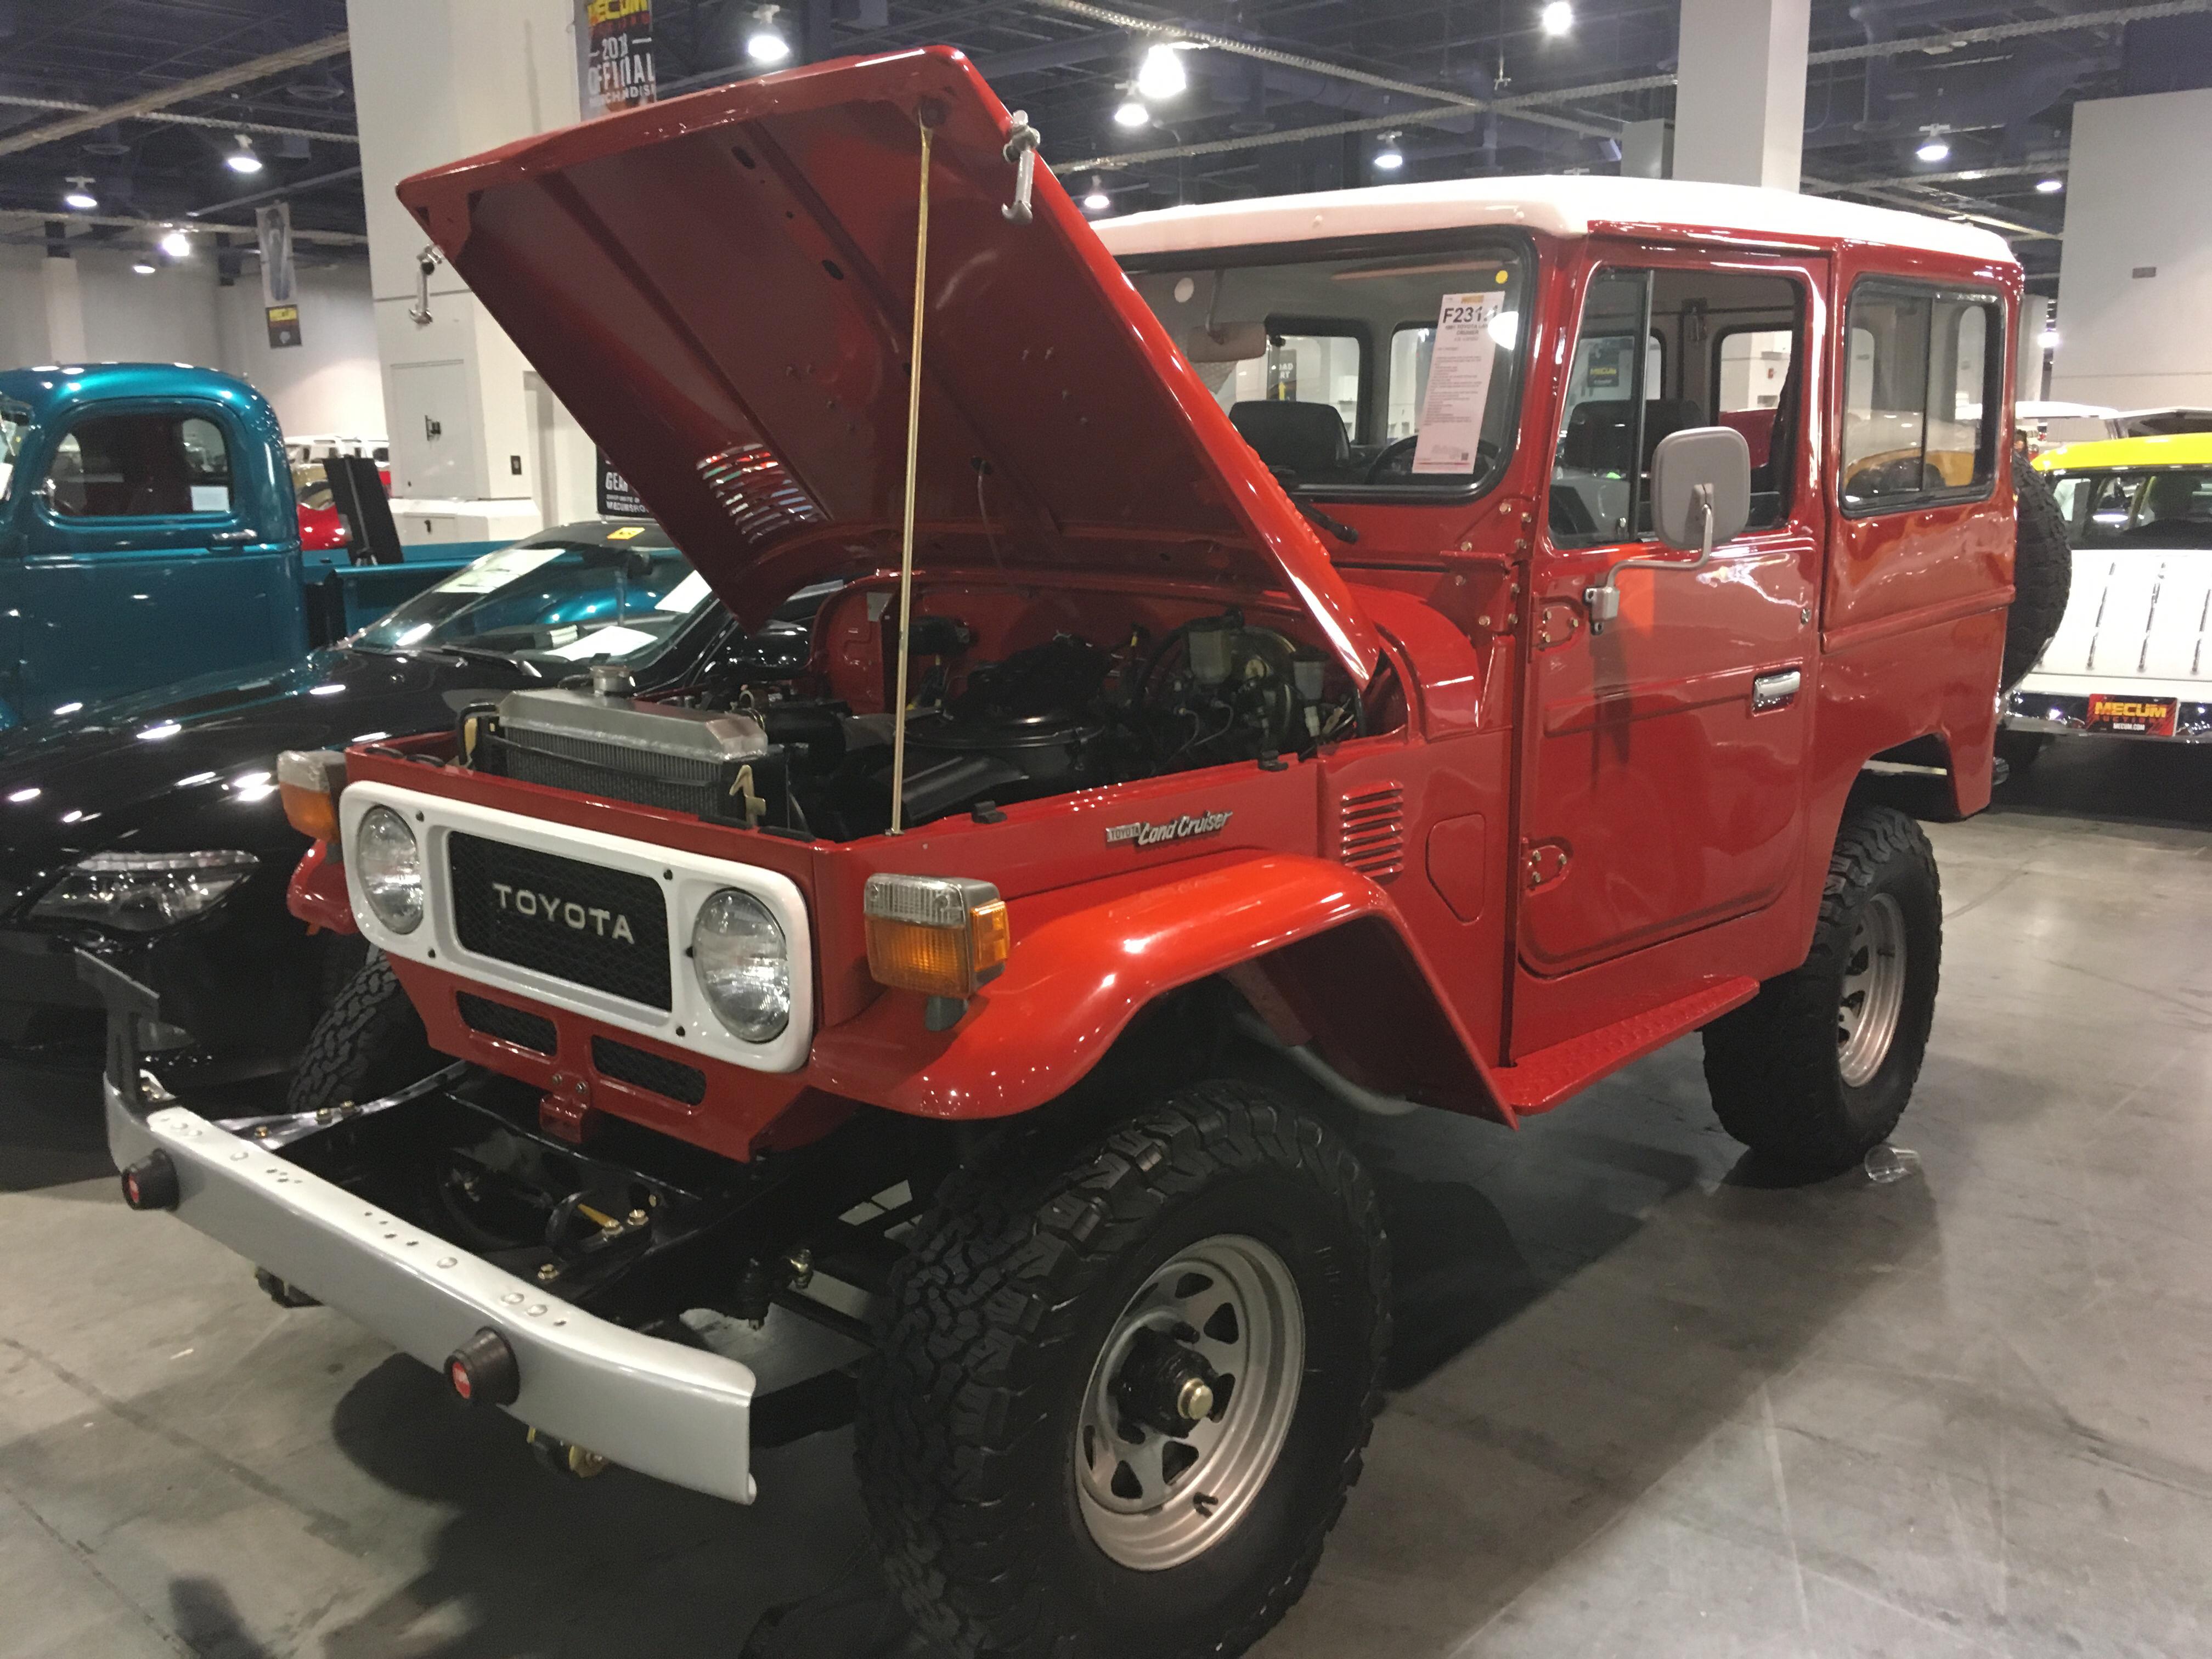 1975 Toyota Land Cruiser Fj40v Values Hagerty Valuation Tool 1960s Options 1981 Hardtop 4x4